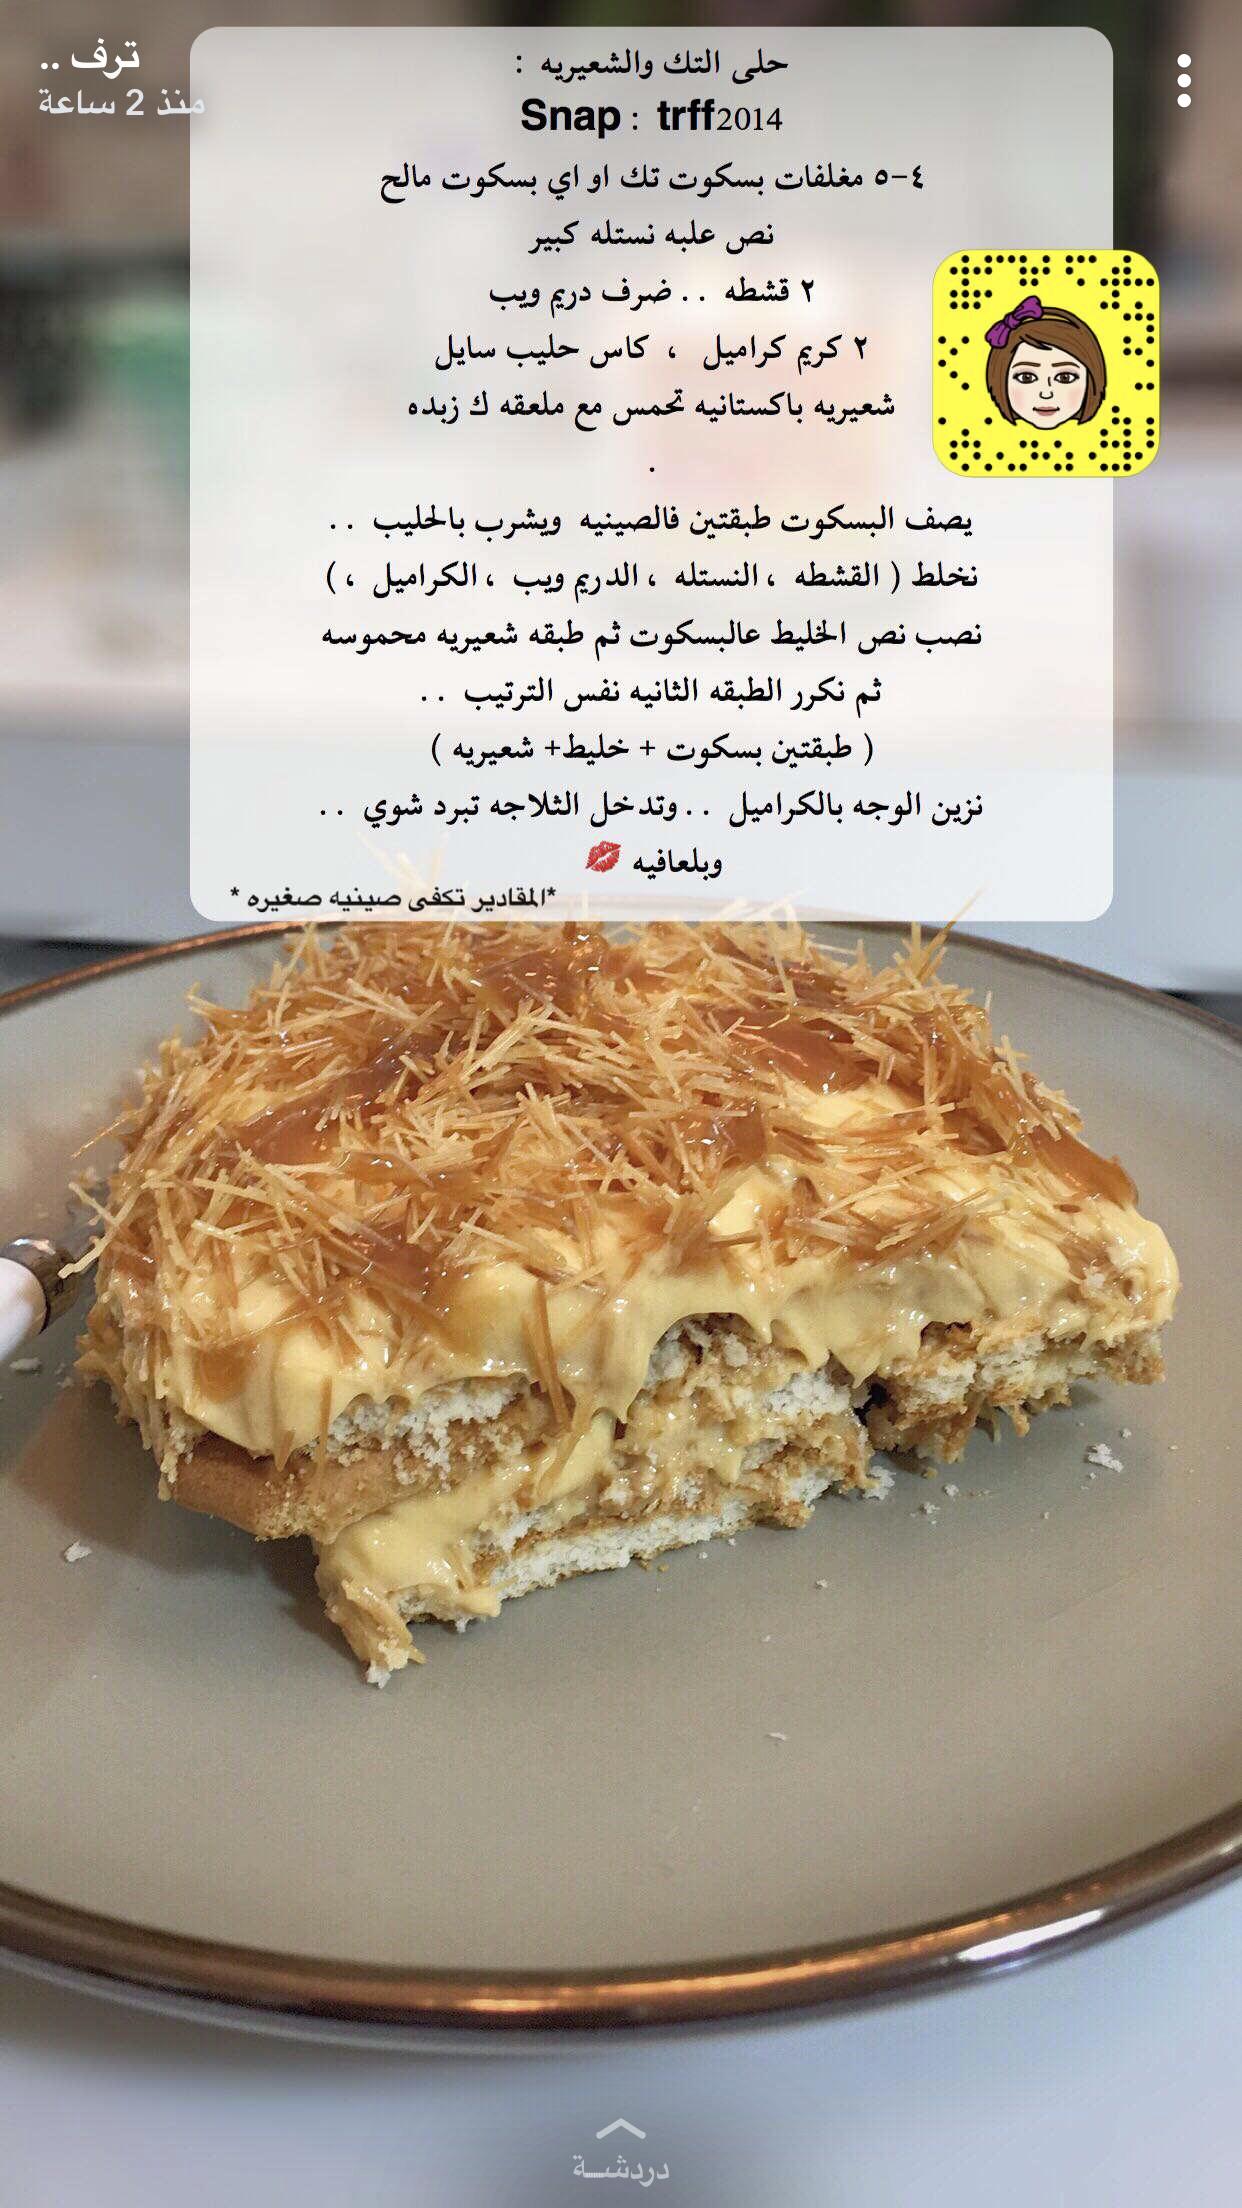 Pin By Haya On طبخات Cooks Diy Food Recipes Yummy Food Dessert Food Videos Desserts